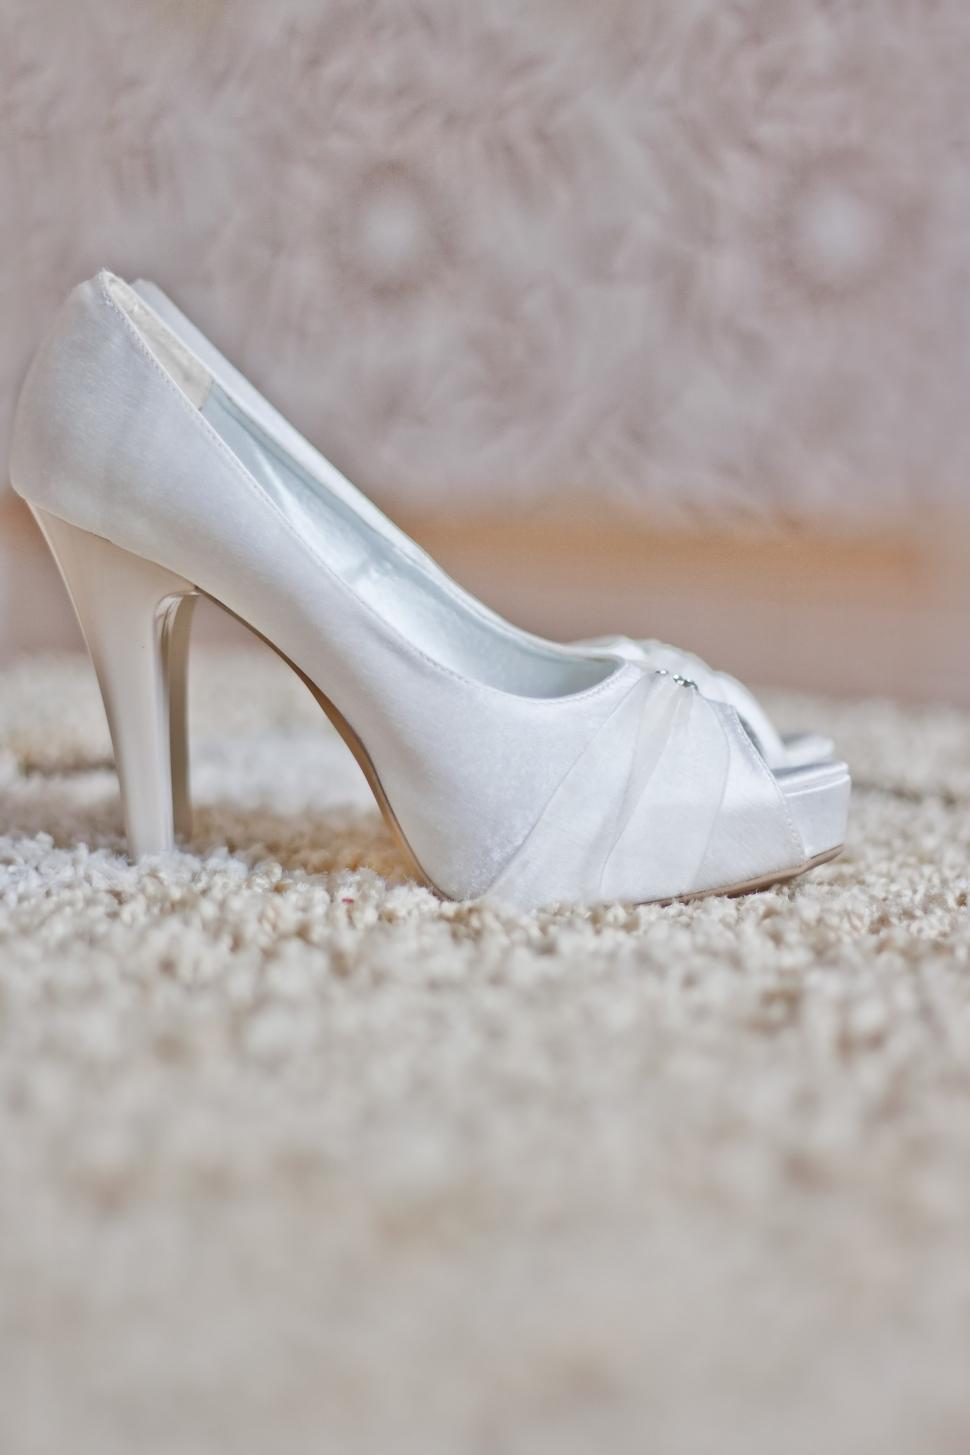 Download Free Stock Photo of higheels shoes wedding white footwear